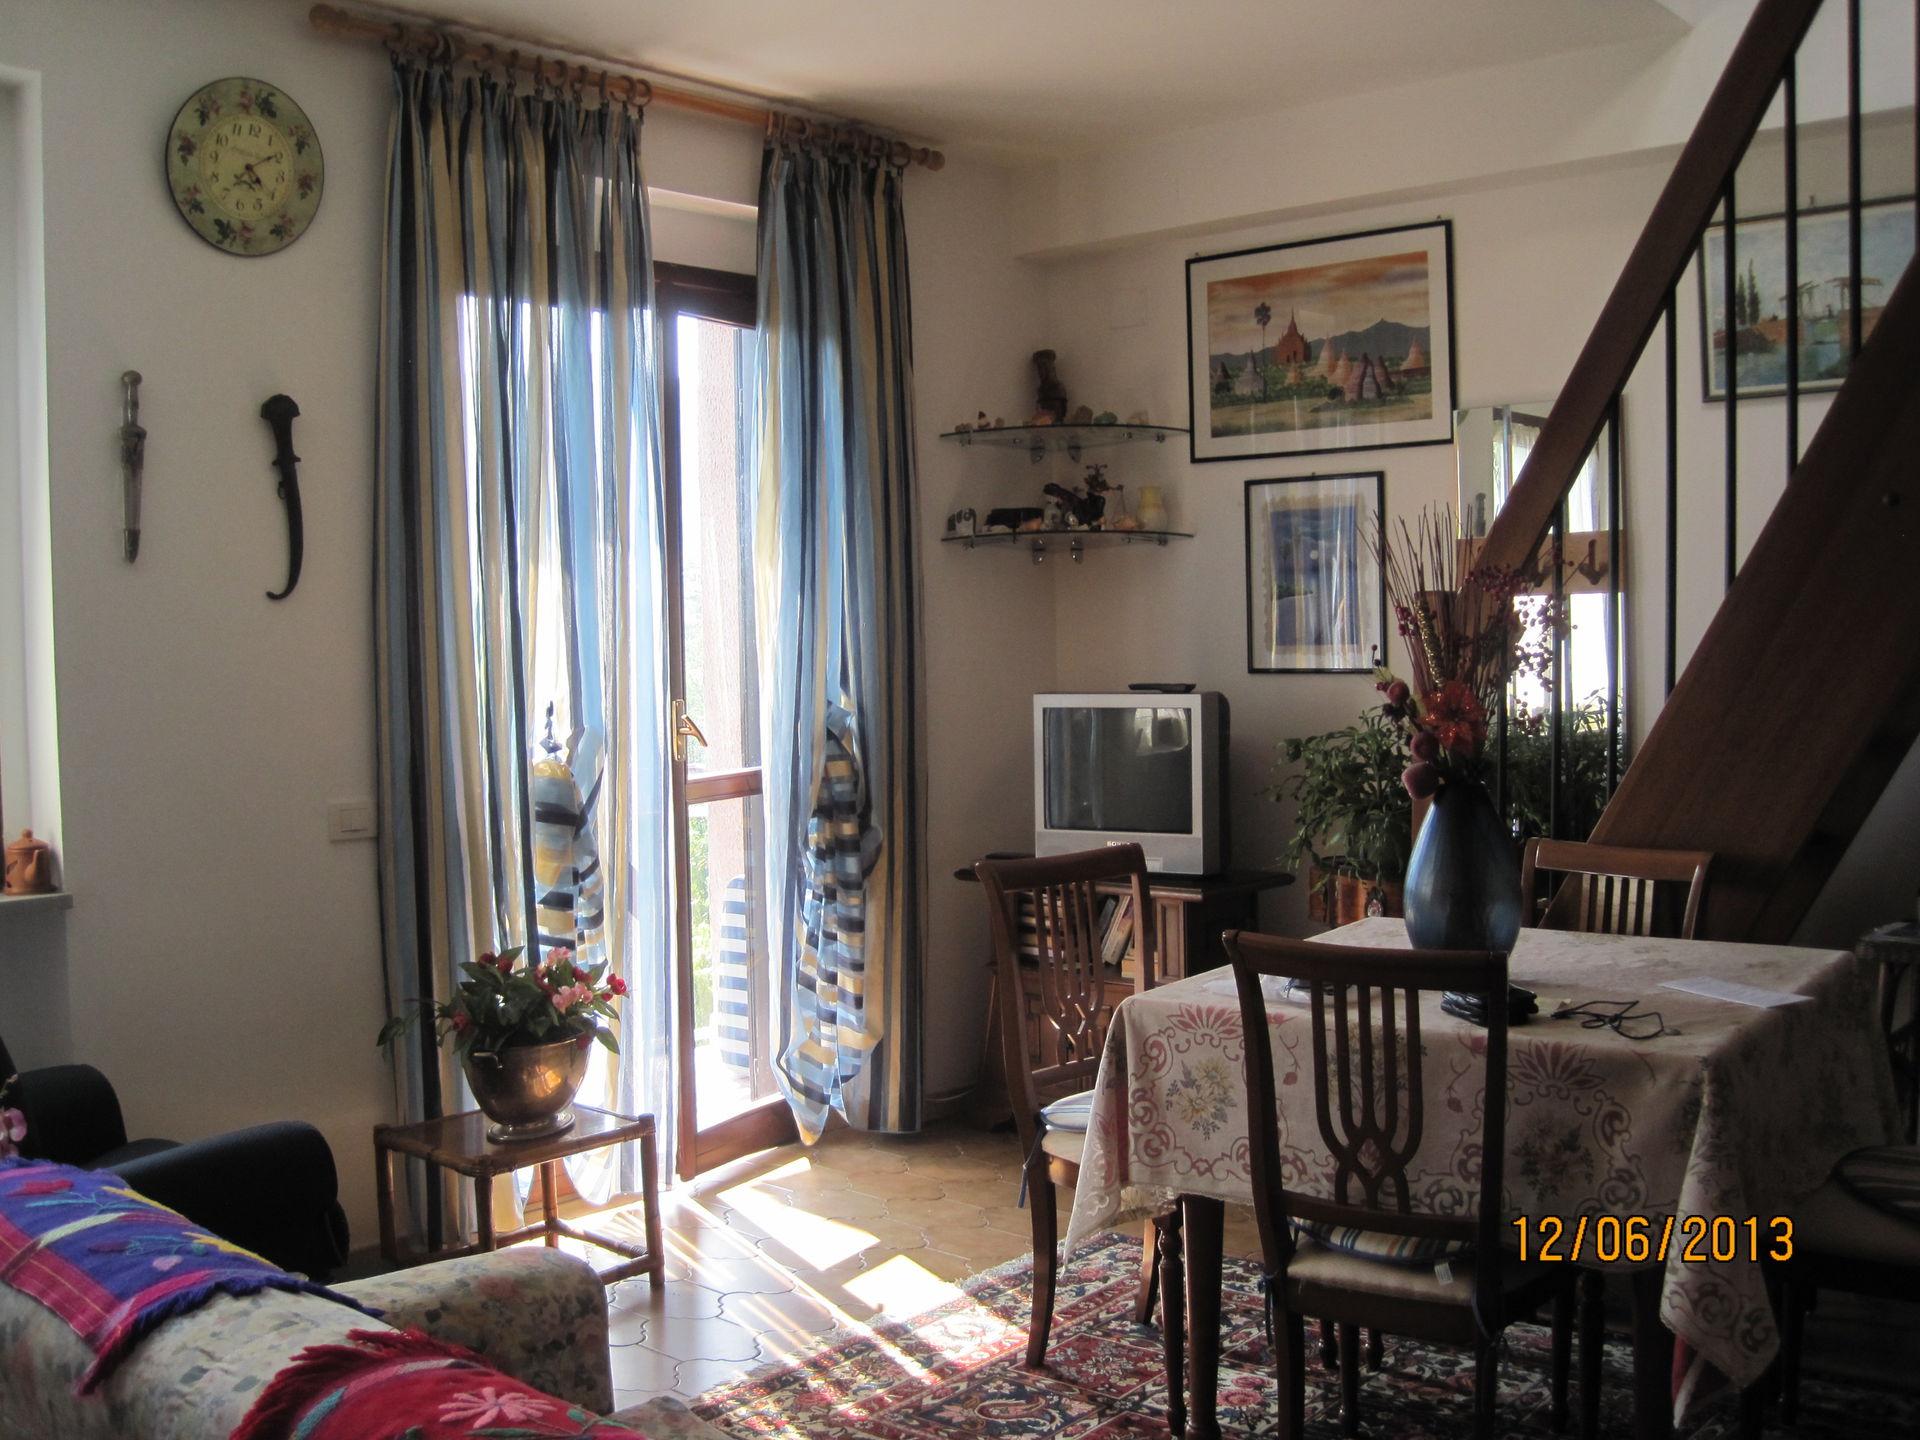 Carro, Liguria not far from Cinque Terre - Home Exchange